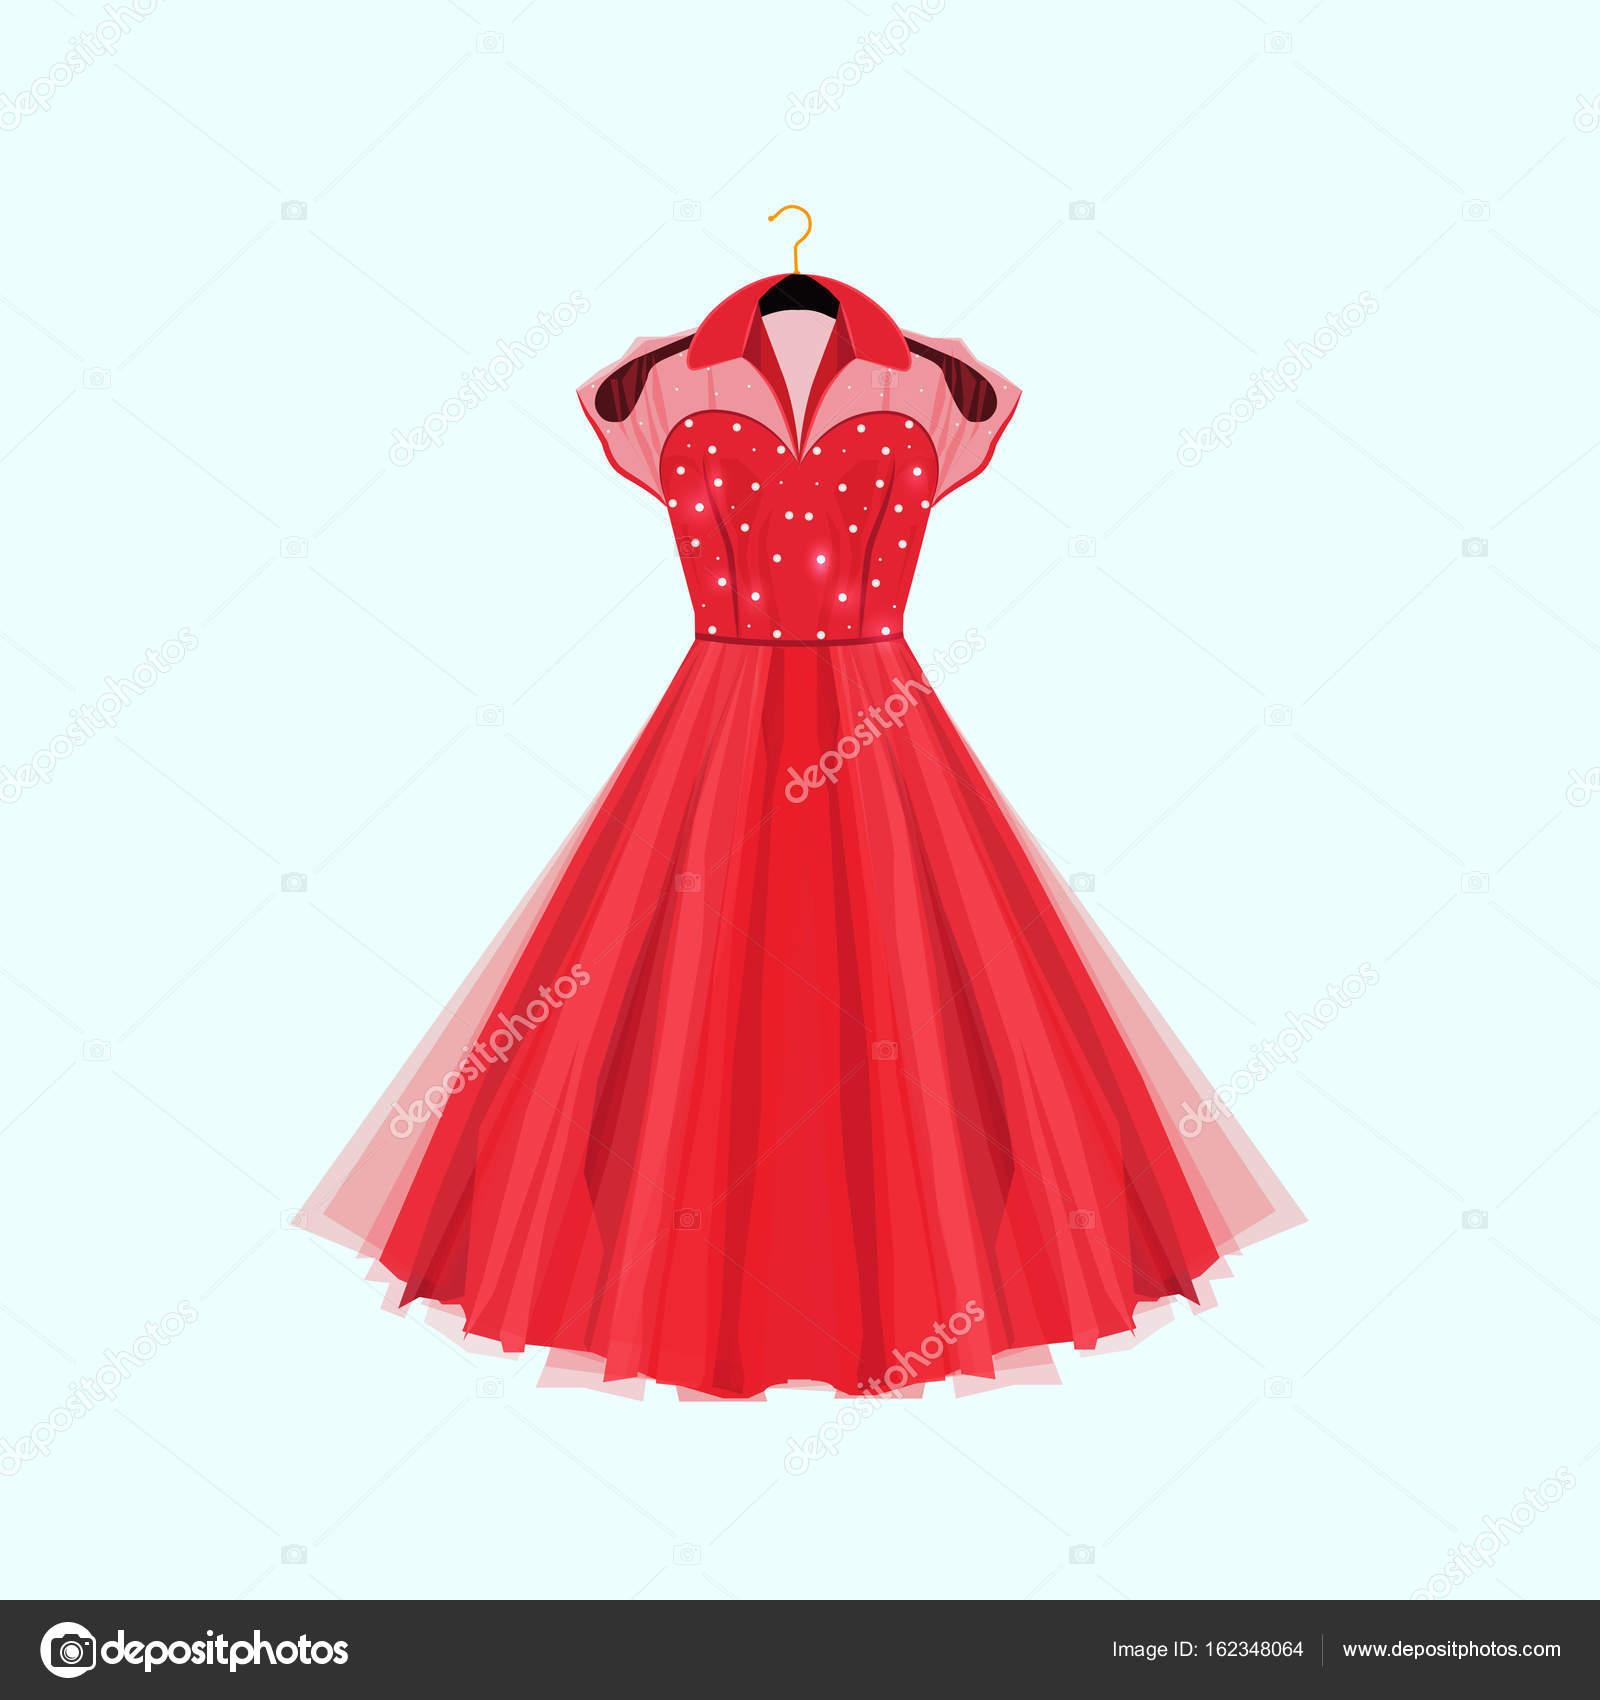 Partykleid rot Retro-Stil. Vektor-Mode-Illustration. Kleid mit ...